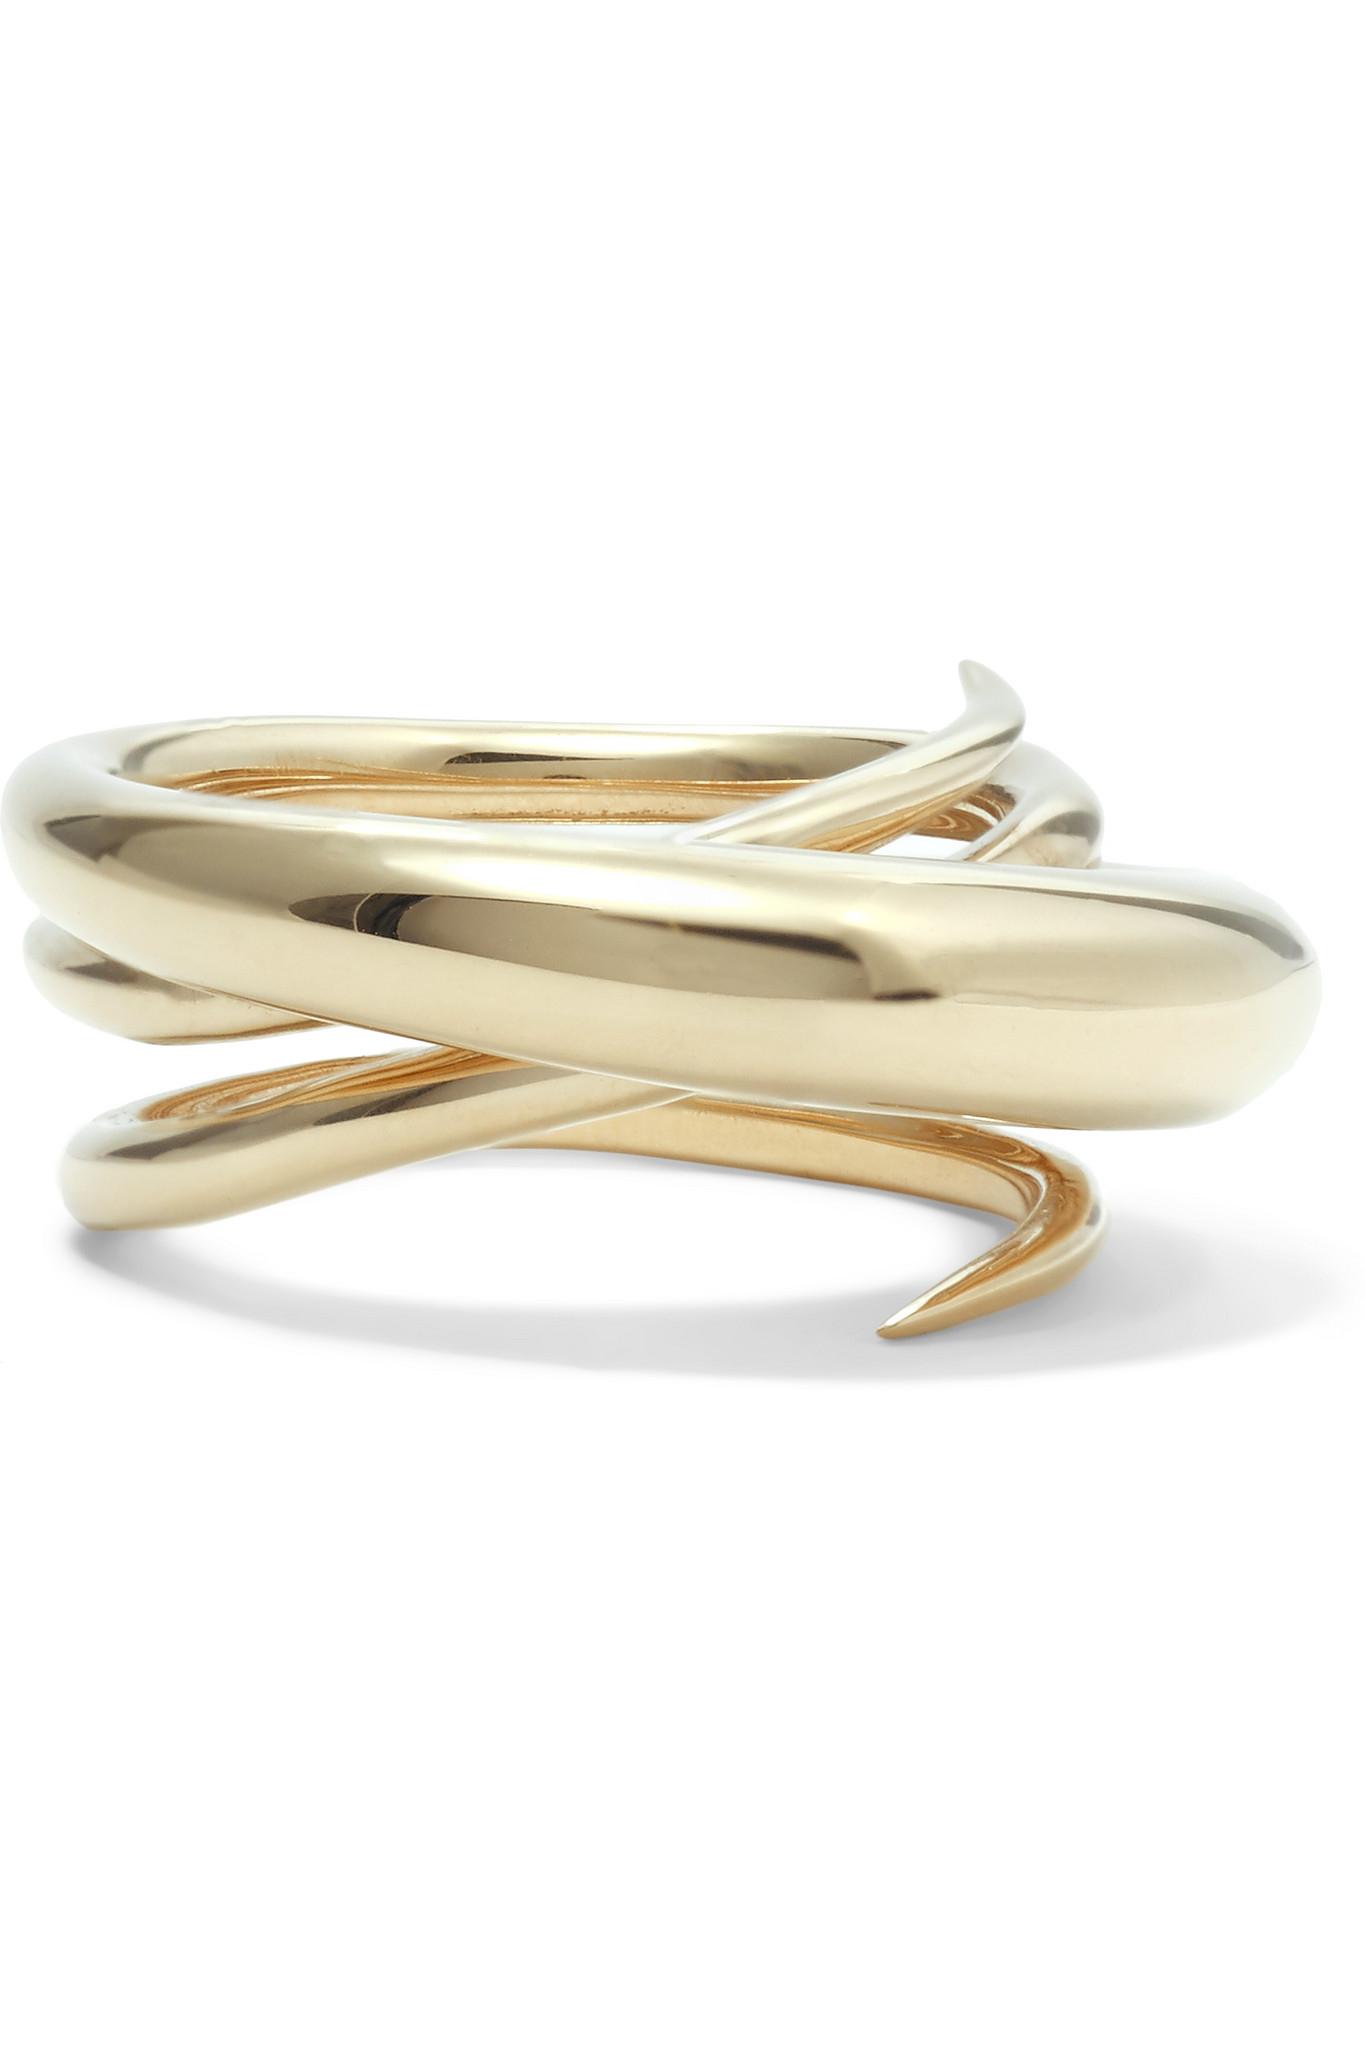 Gold Hurly Burly ring - Metallic Charlotte Chesnais tTM1j14LWT